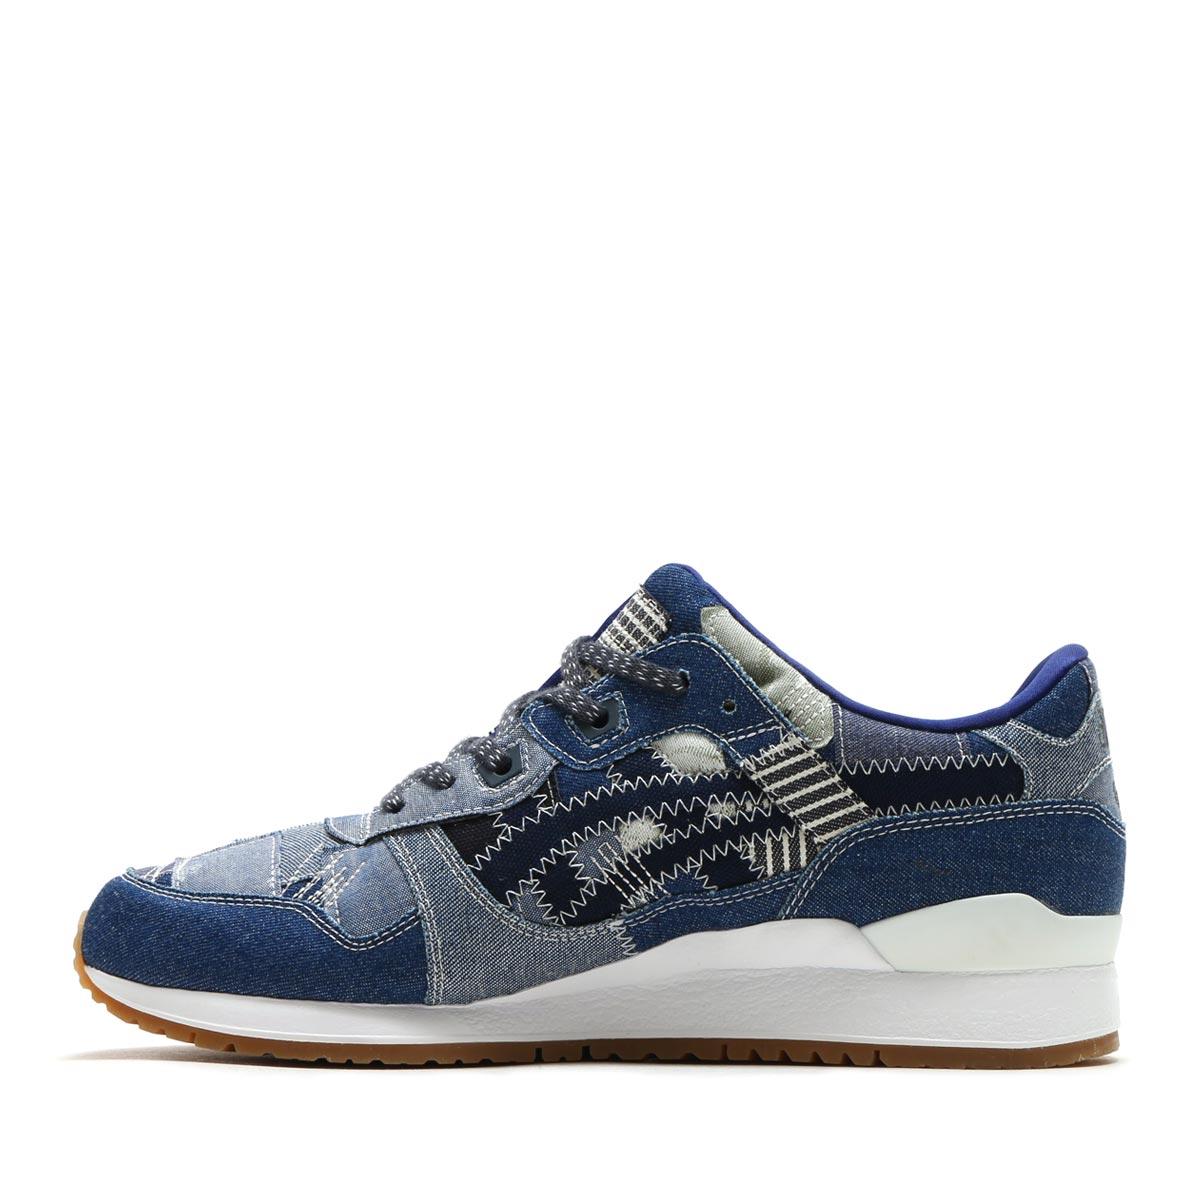 super popular a7d56 1f94c asics tiger gel-lyte ii ranru pack indigo blue 5 - WearTesters